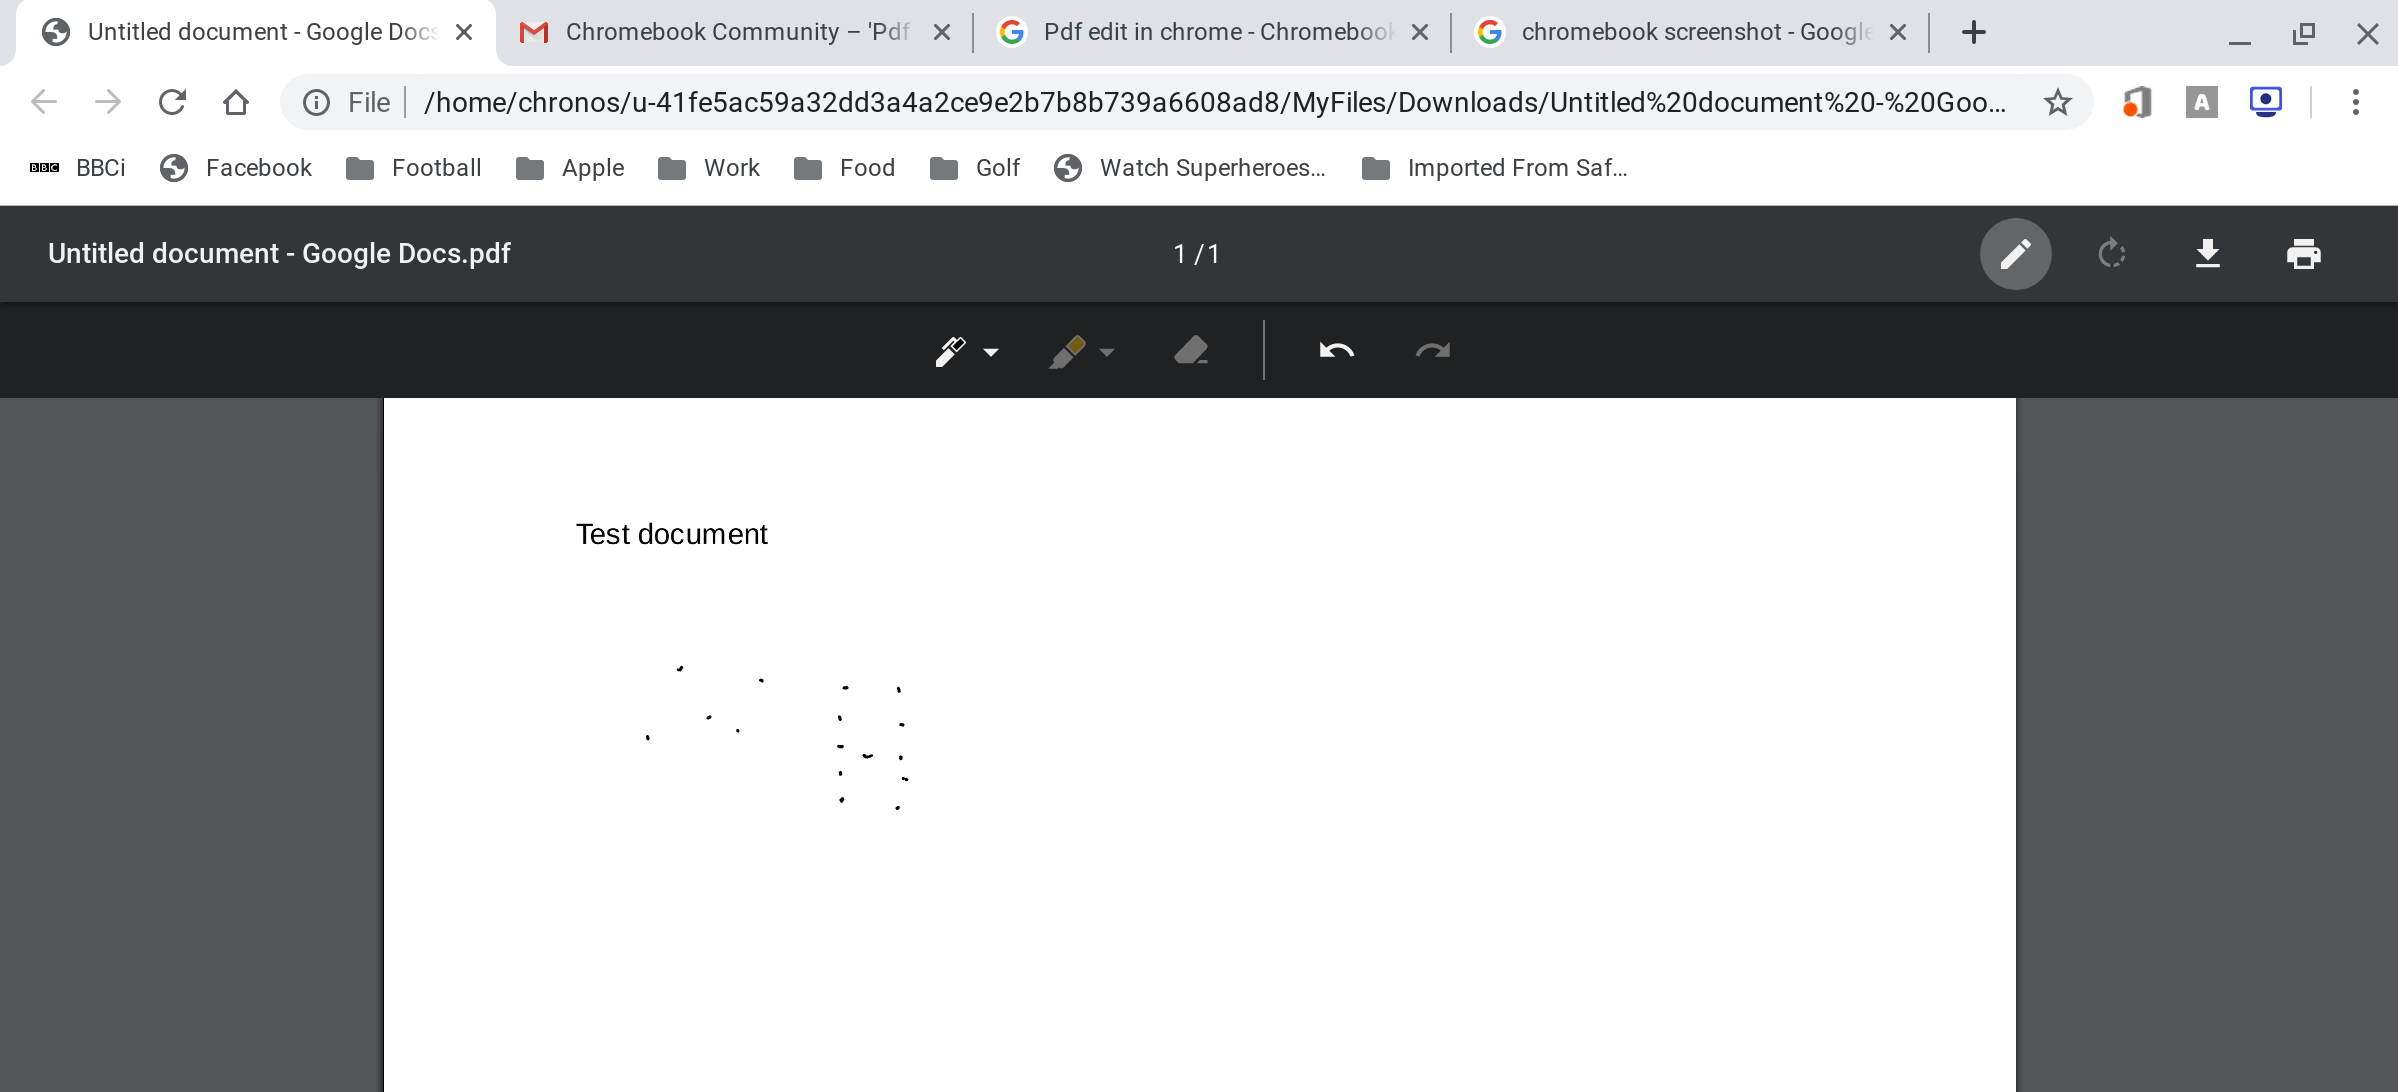 Chromebook Pdf Editor Free